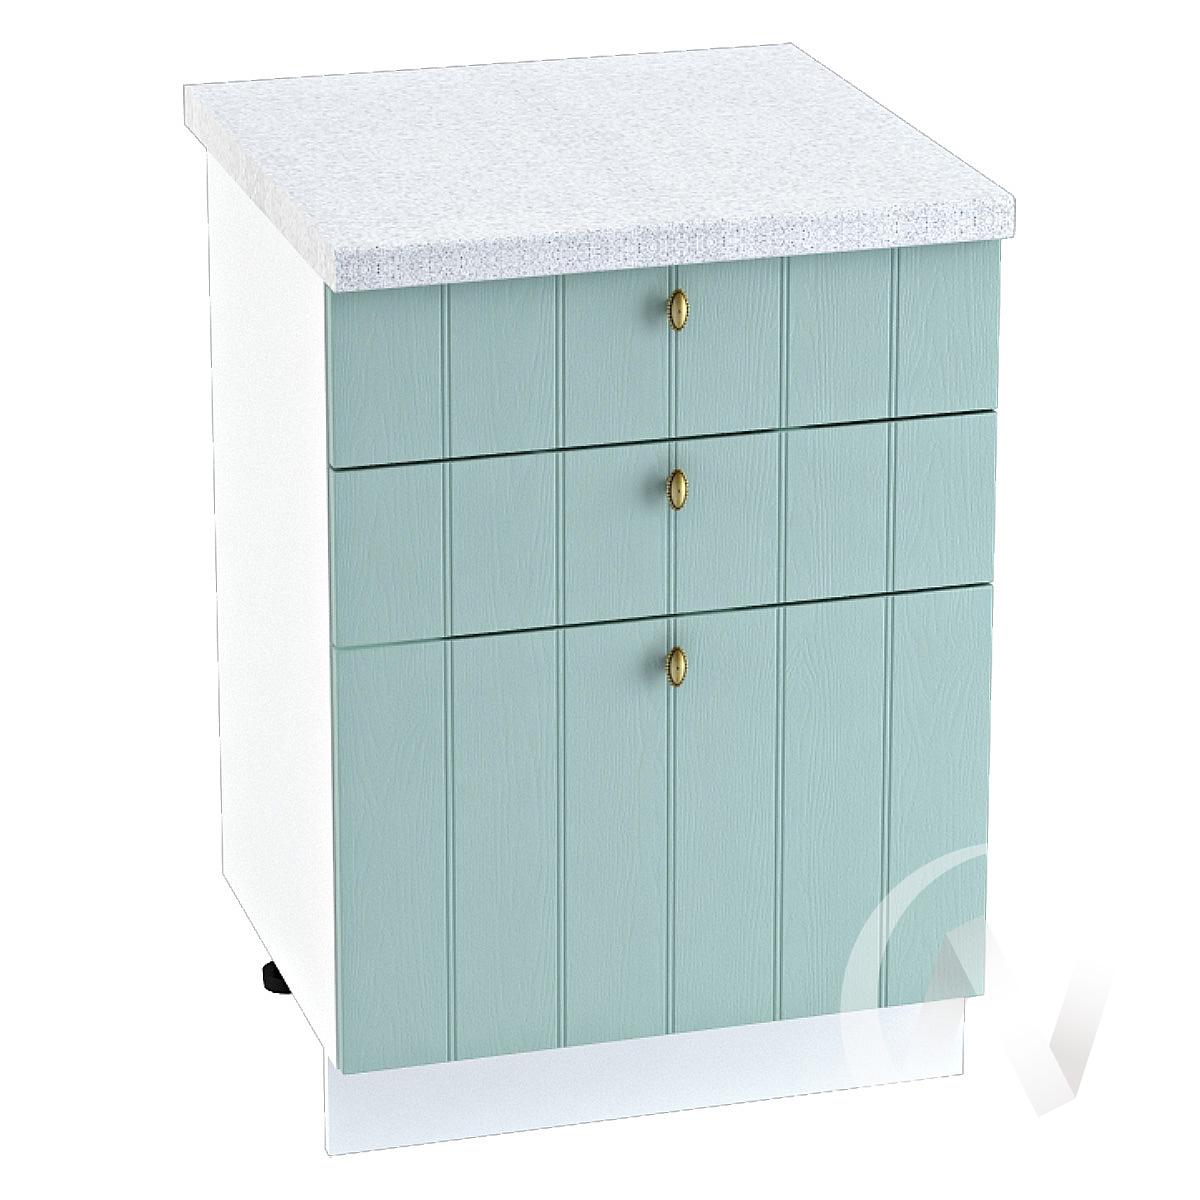 "Кухня ""Прованс"": Шкаф нижний с 3-мя ящиками 600, ШН3Я 600 (голубой/корпус белый)"